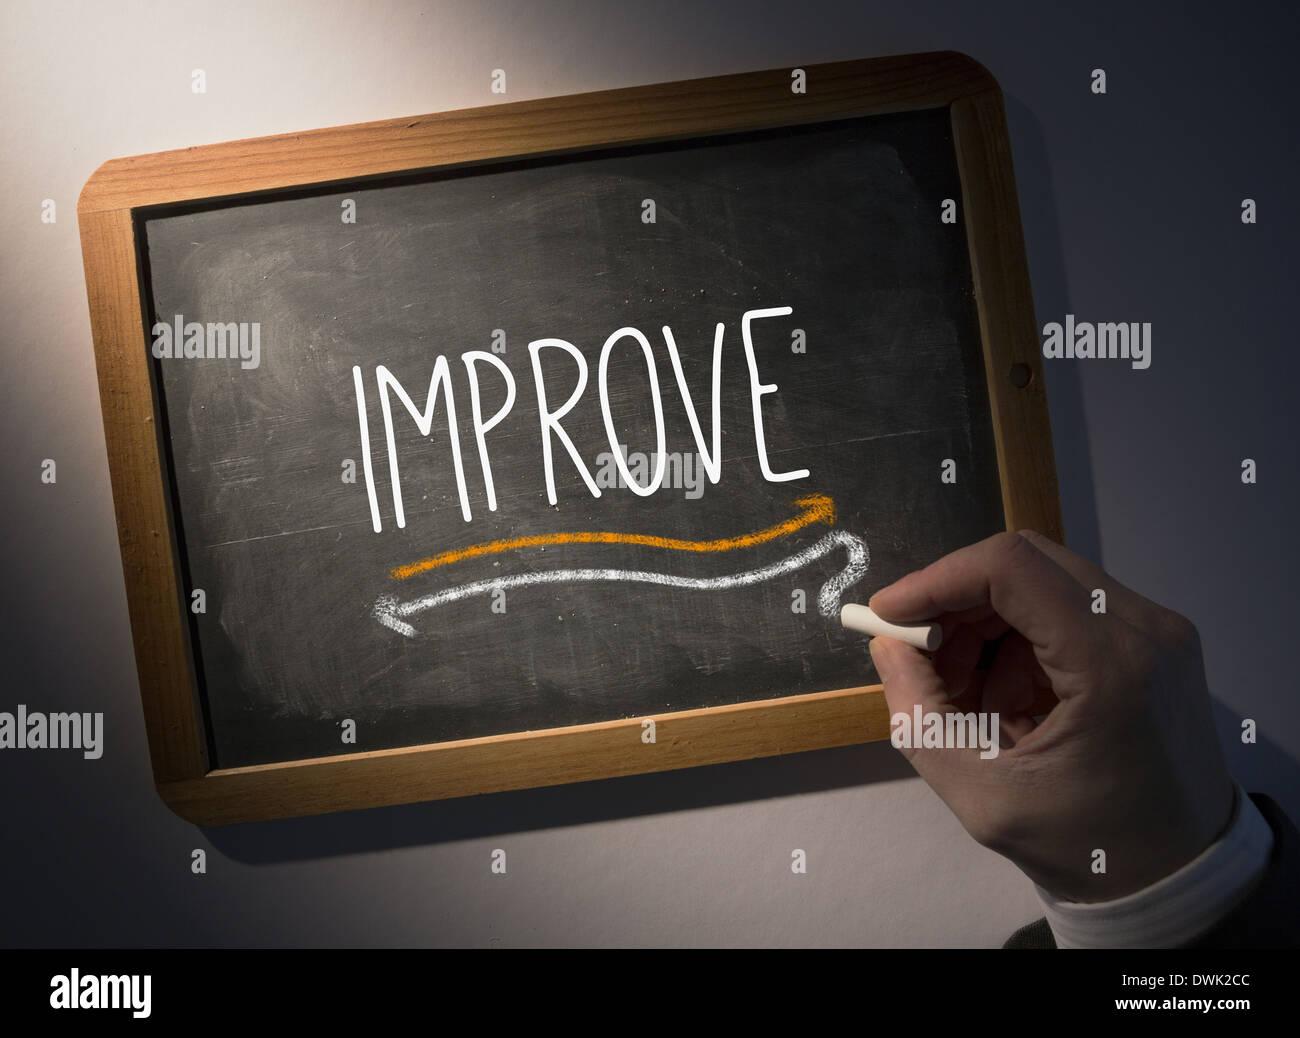 Hand writing Improve on chalkboard - Stock Image